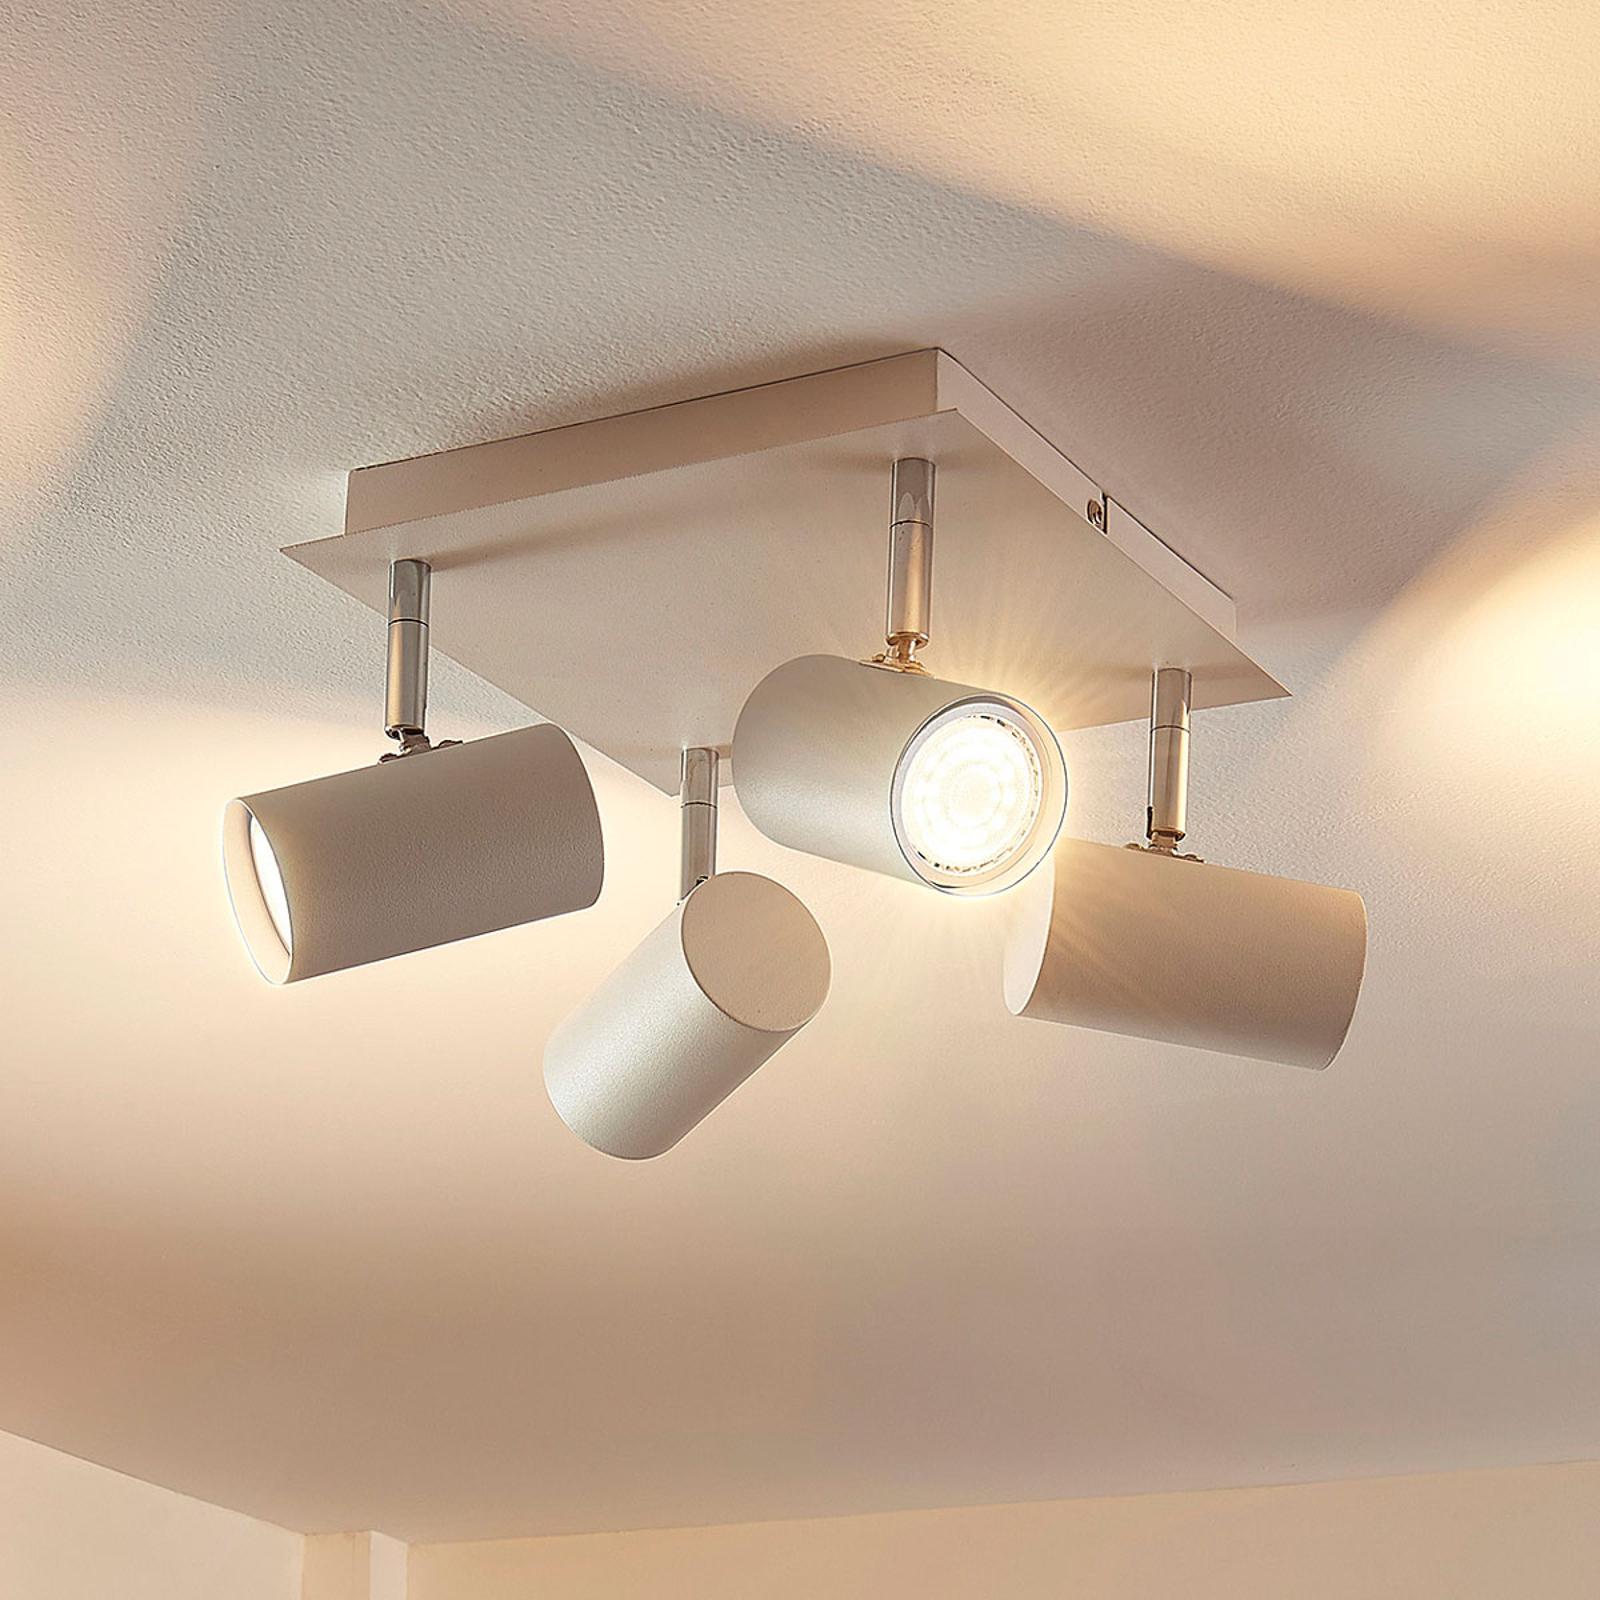 Kvadratisk LED-taklampe Iluk, fire lys